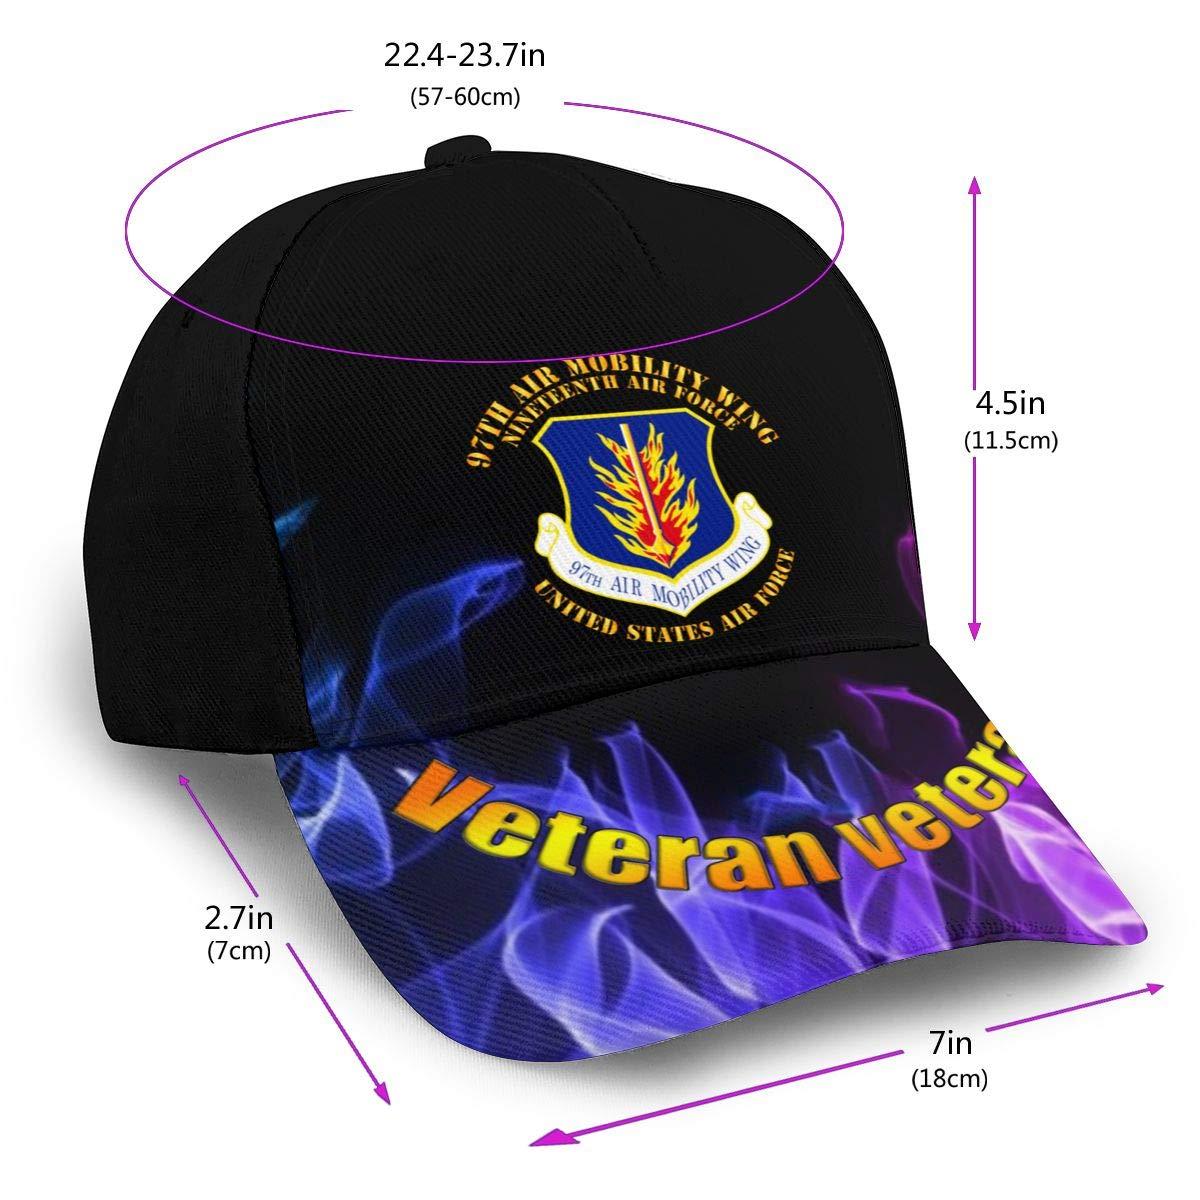 97th Air Mobility Wing Nineteenth Air Force Classic Adult Hop Printing Bend Along Baseball Hat Snapback Men Women Caps